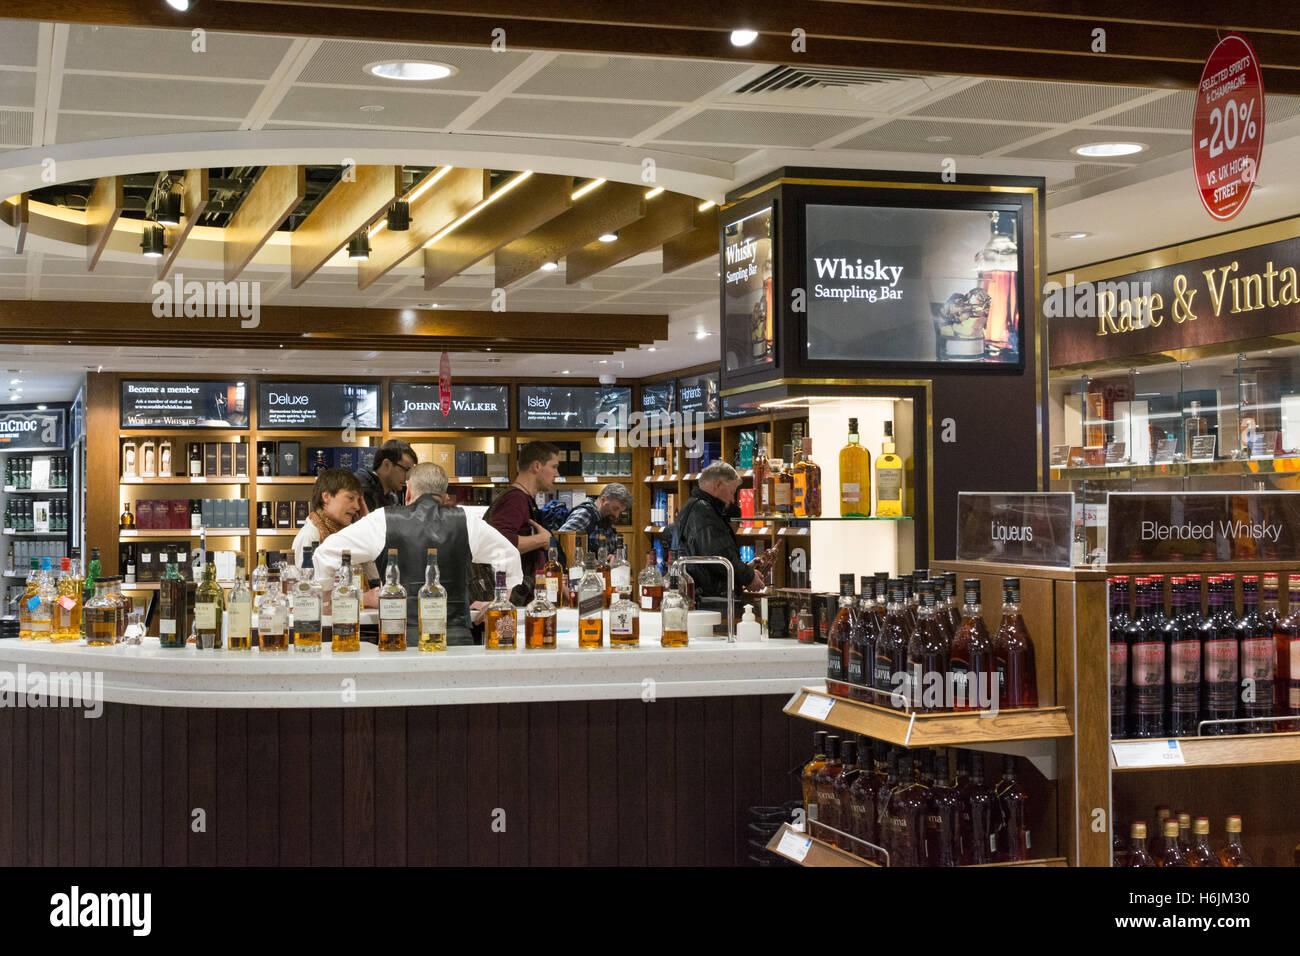 Edinburgh Airport duty free whisky sampling bar at world duty free, Edinburgh, Scotland, UK - Stock Image